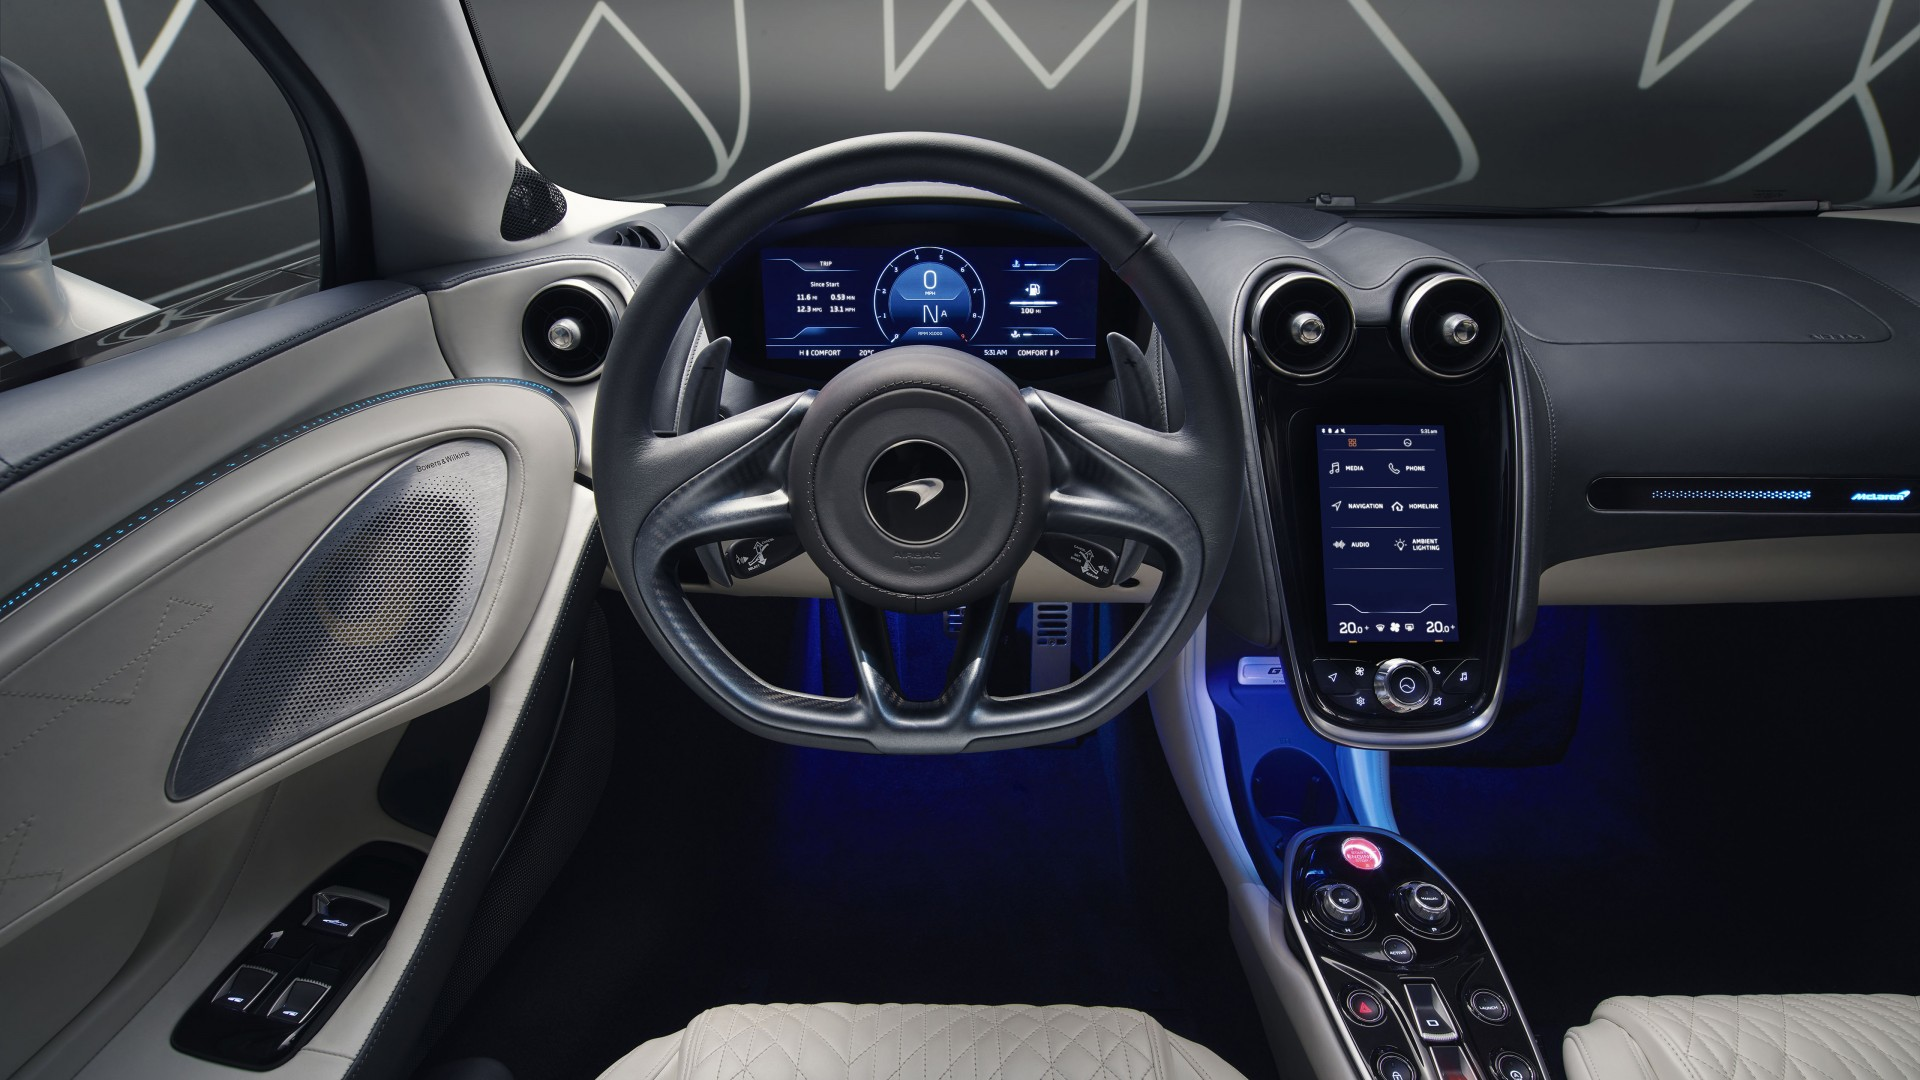 Mclaren Gt By Mso 2019 5k Interior Wallpaper Hd Car